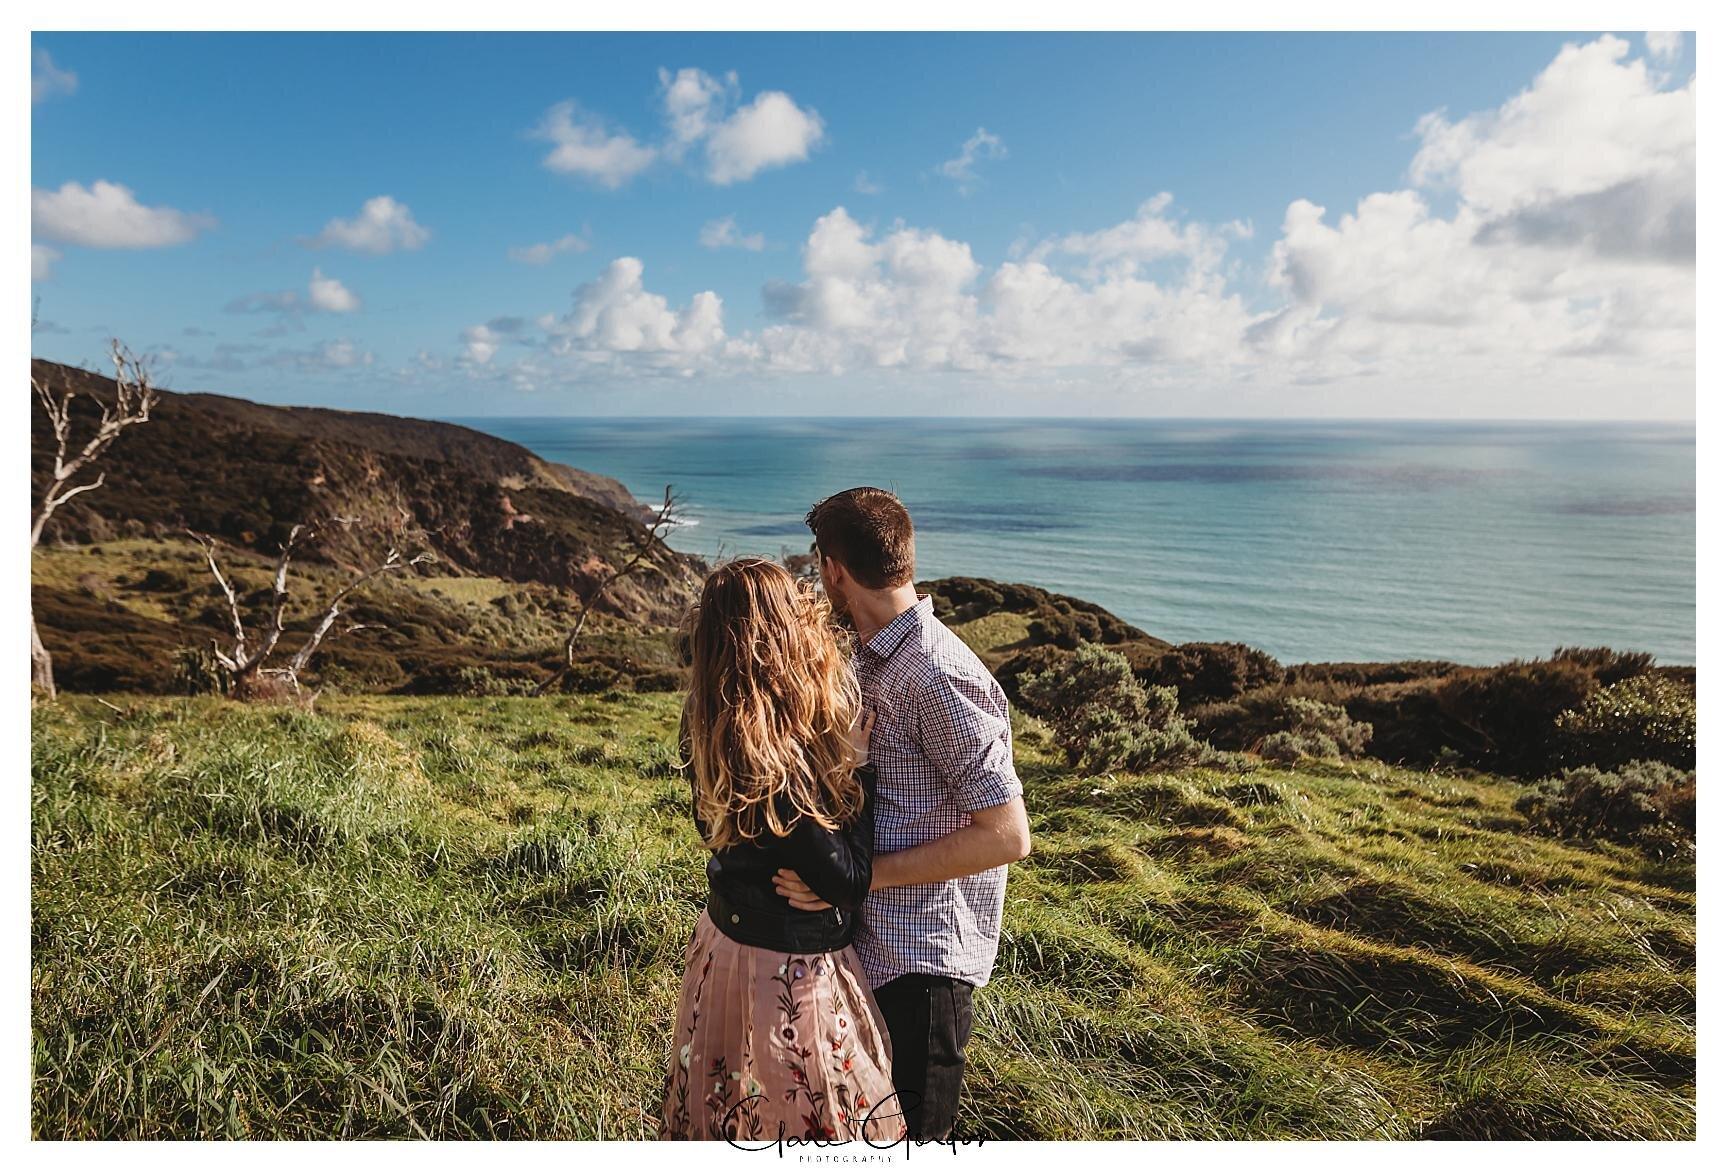 Raglan-beach-NZ-couples-engagement-photos-West-coast-Newzealand (3).jpg